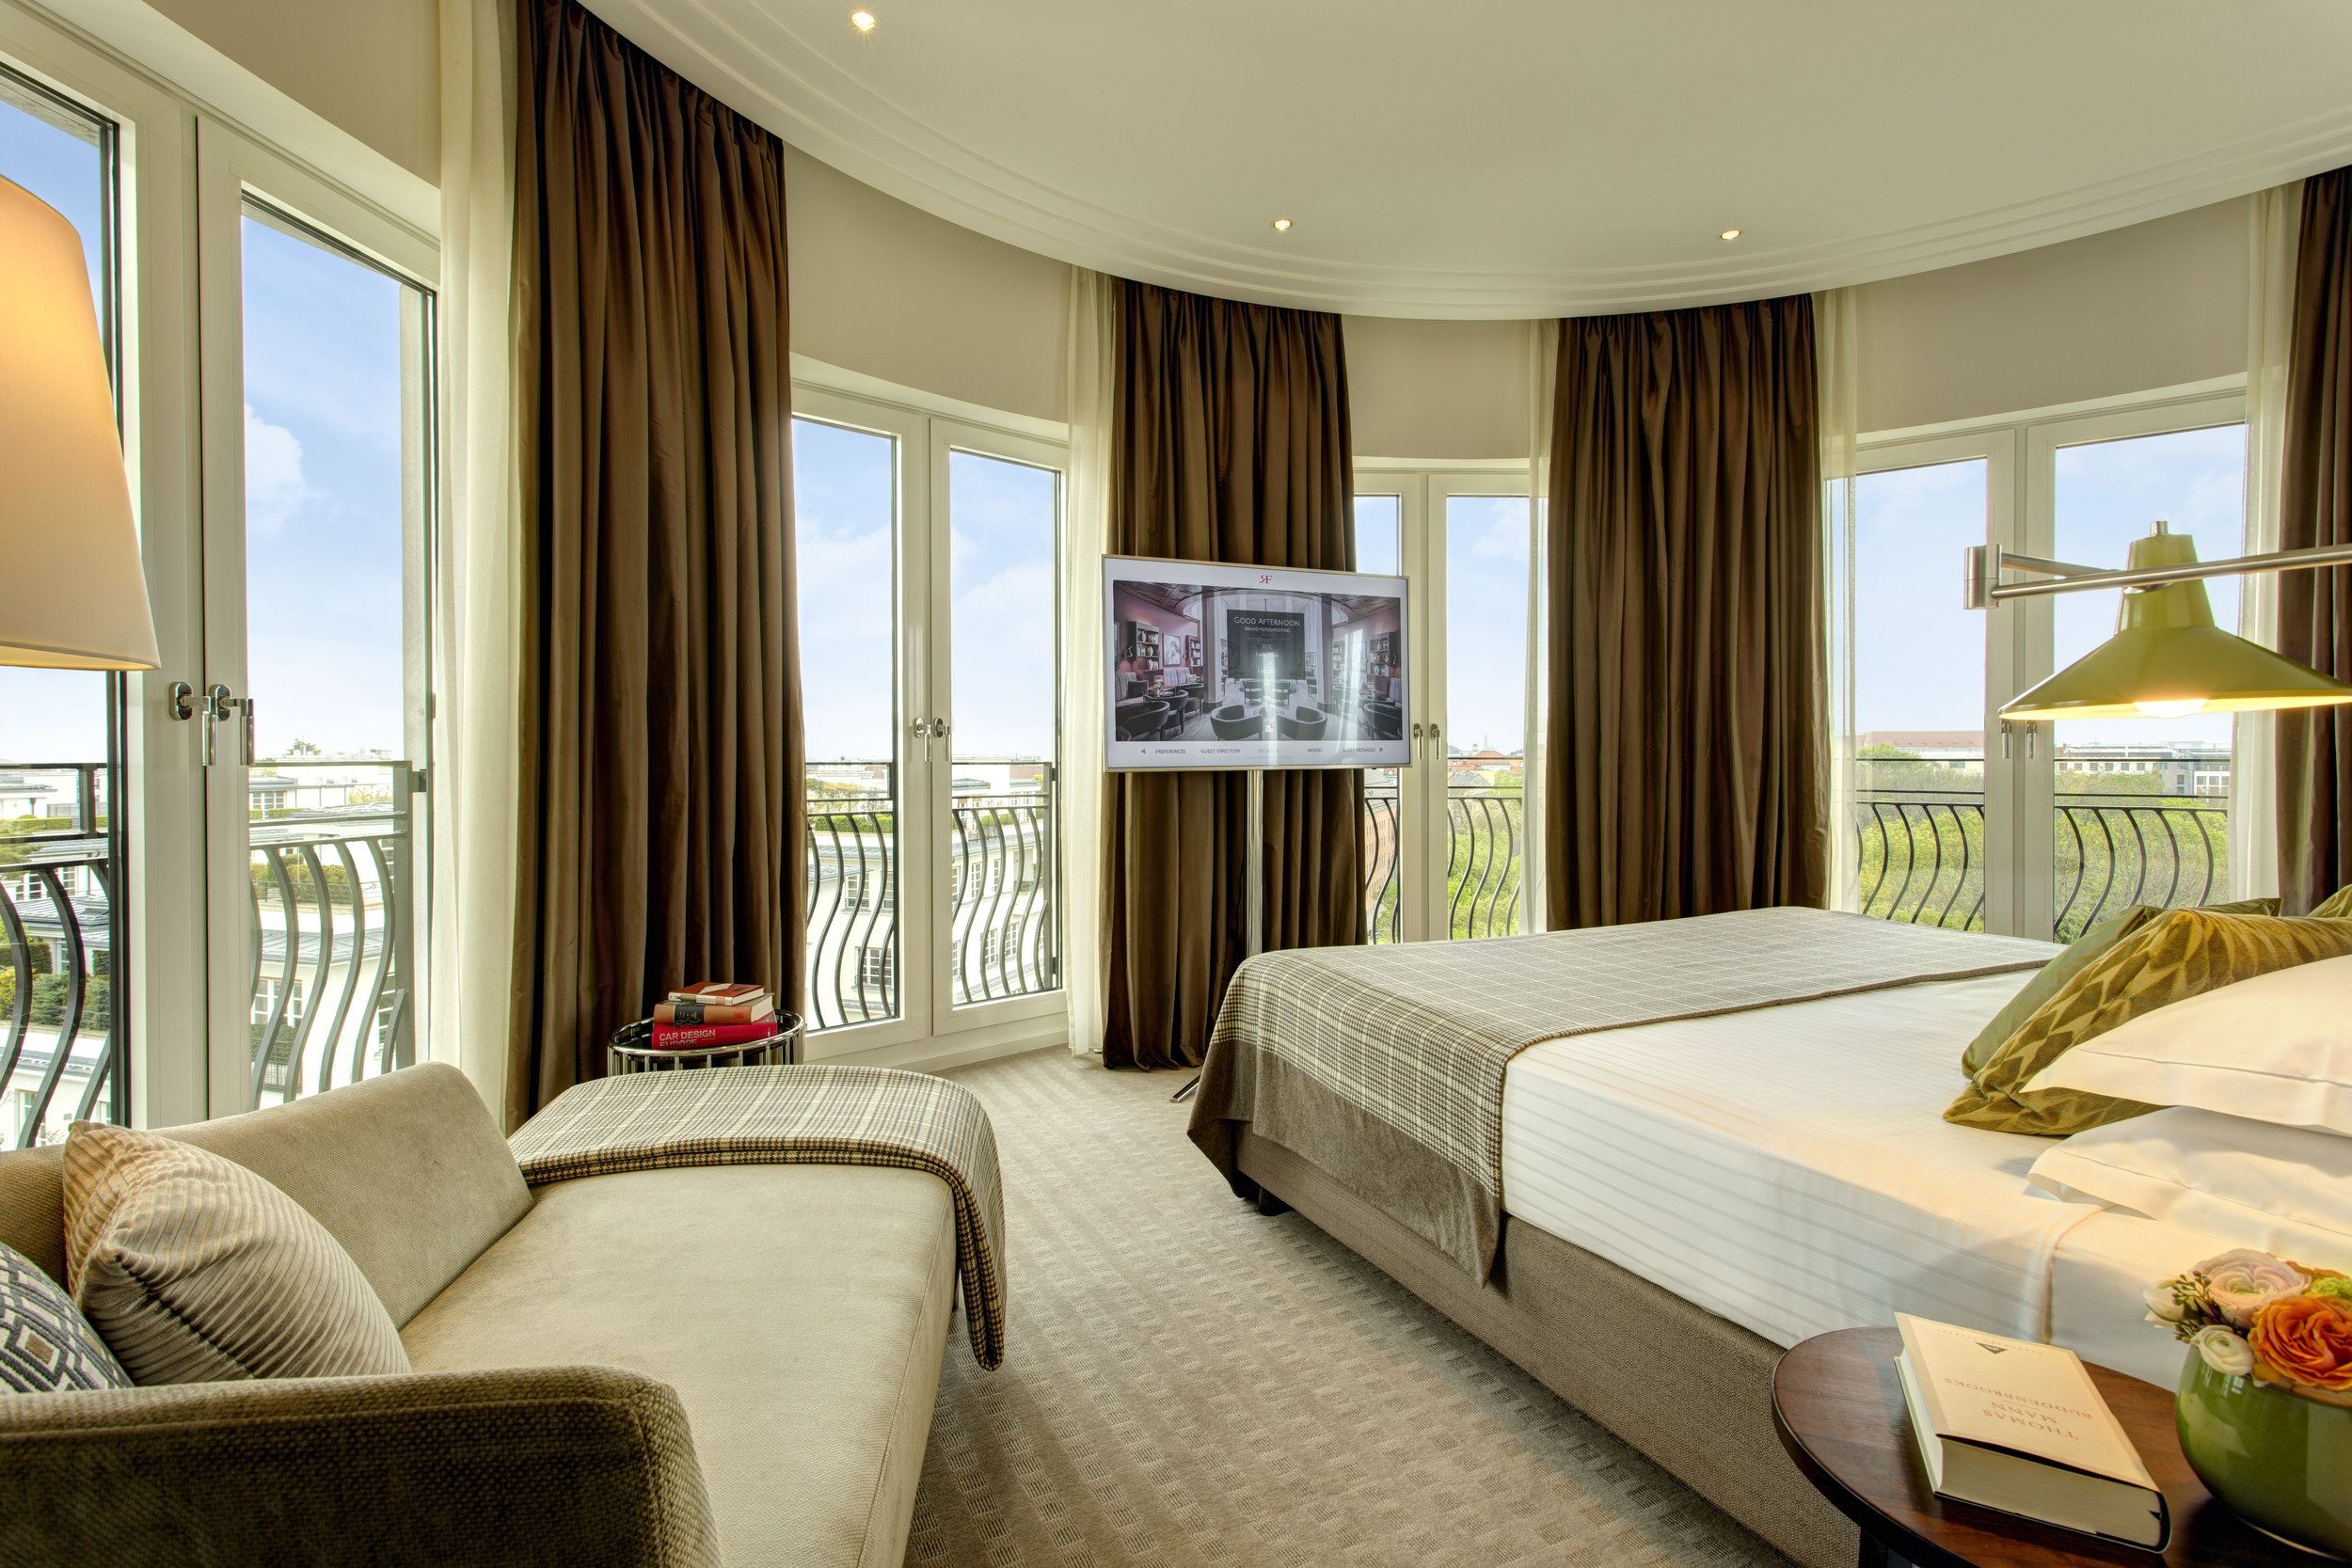 15 RFH The Charles Hotel - Executive Suite 7063 JG May 17.JPG